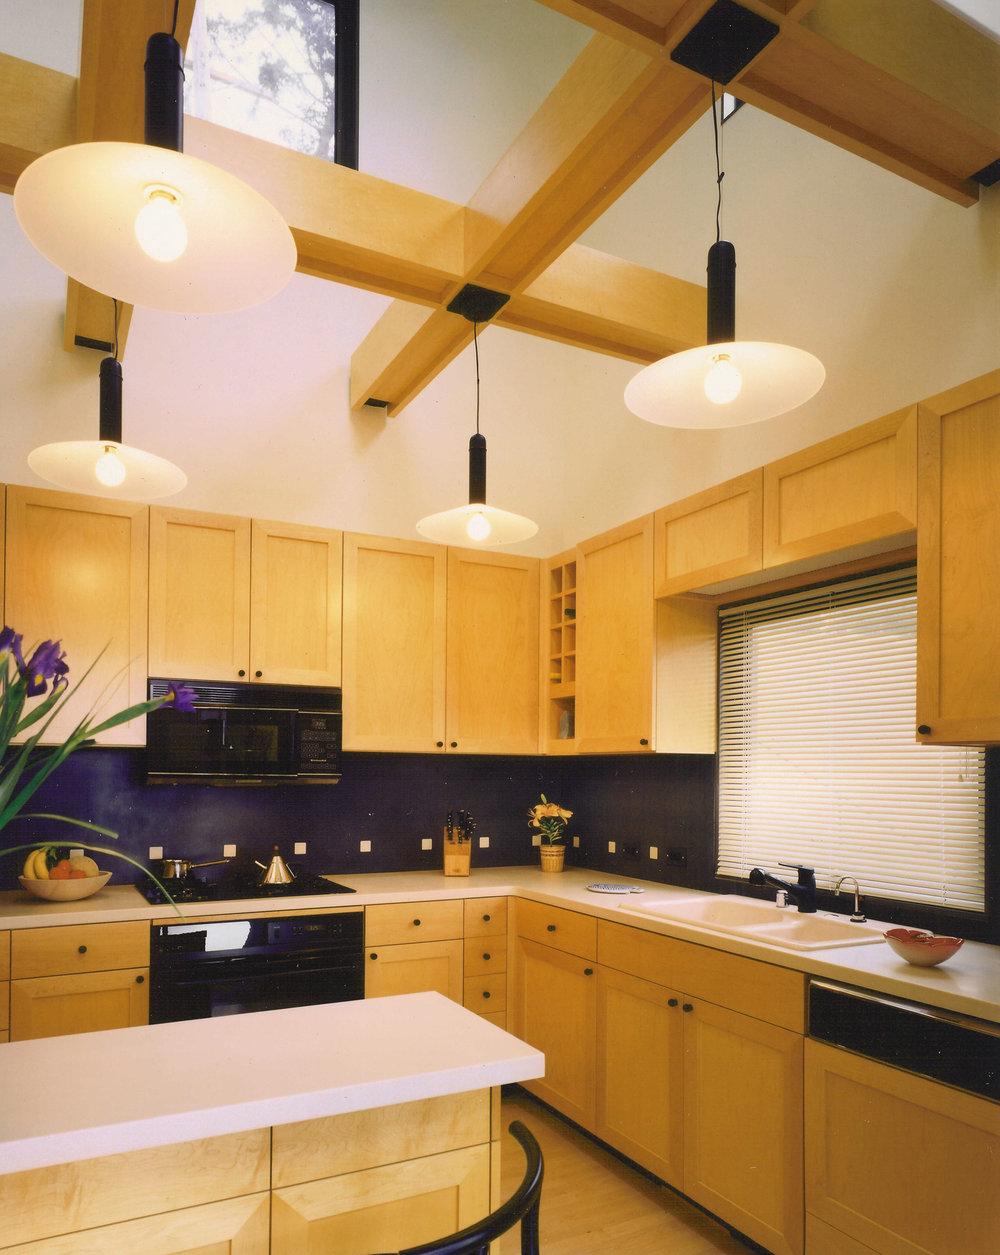 Kaplan-Architects-new-modern-hillside-house-kitchen-2.jpg